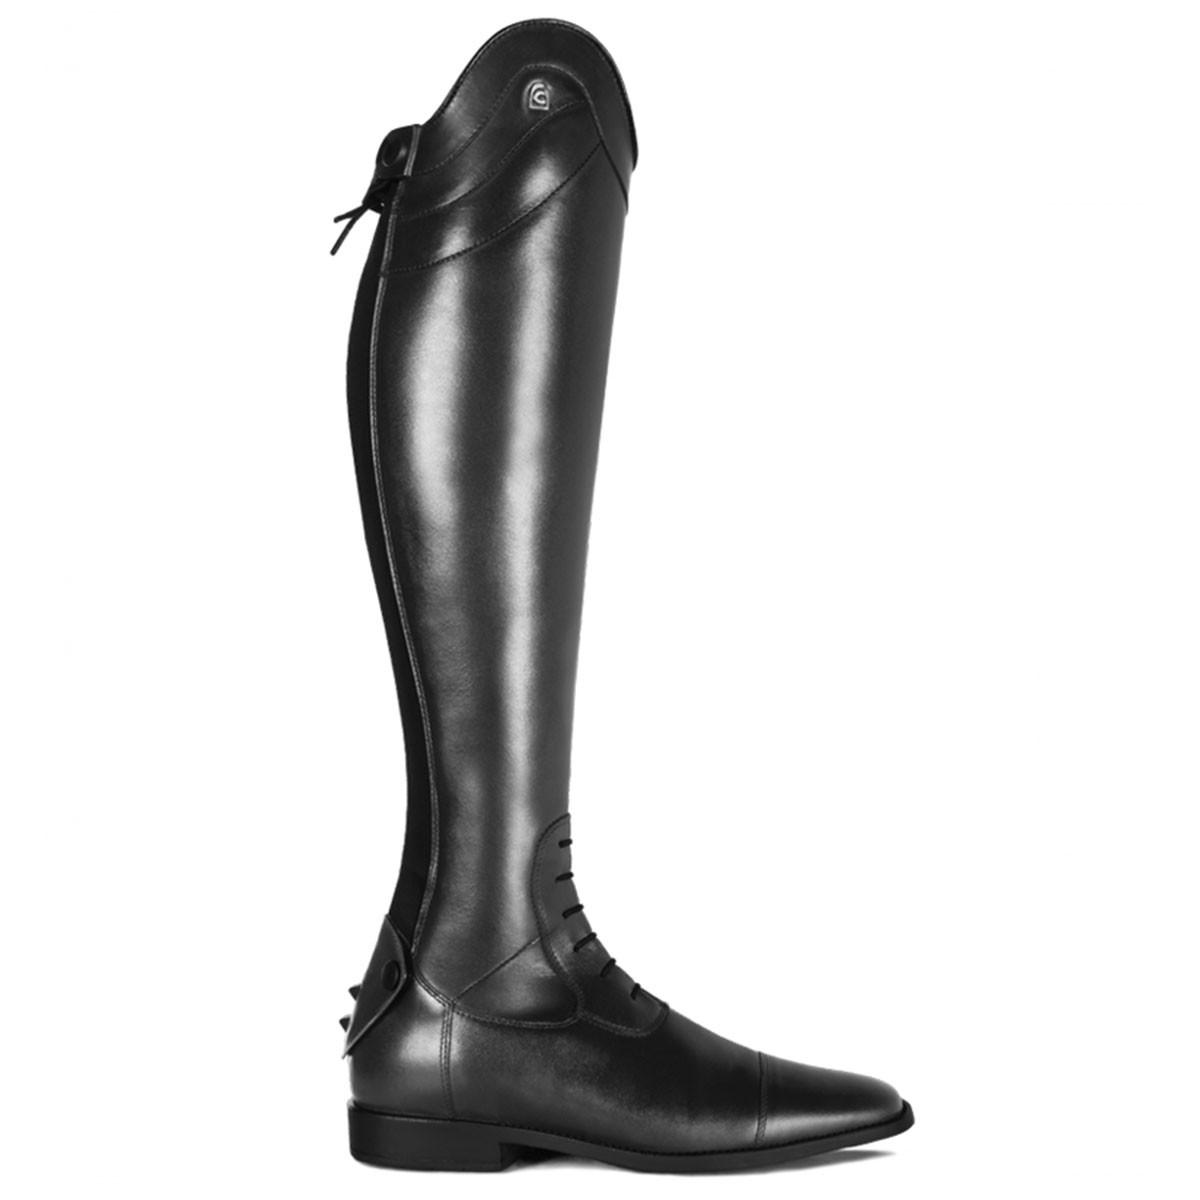 Cavallo Linus Slim rijlaars zwart maat:5-5.5 / h47-w32